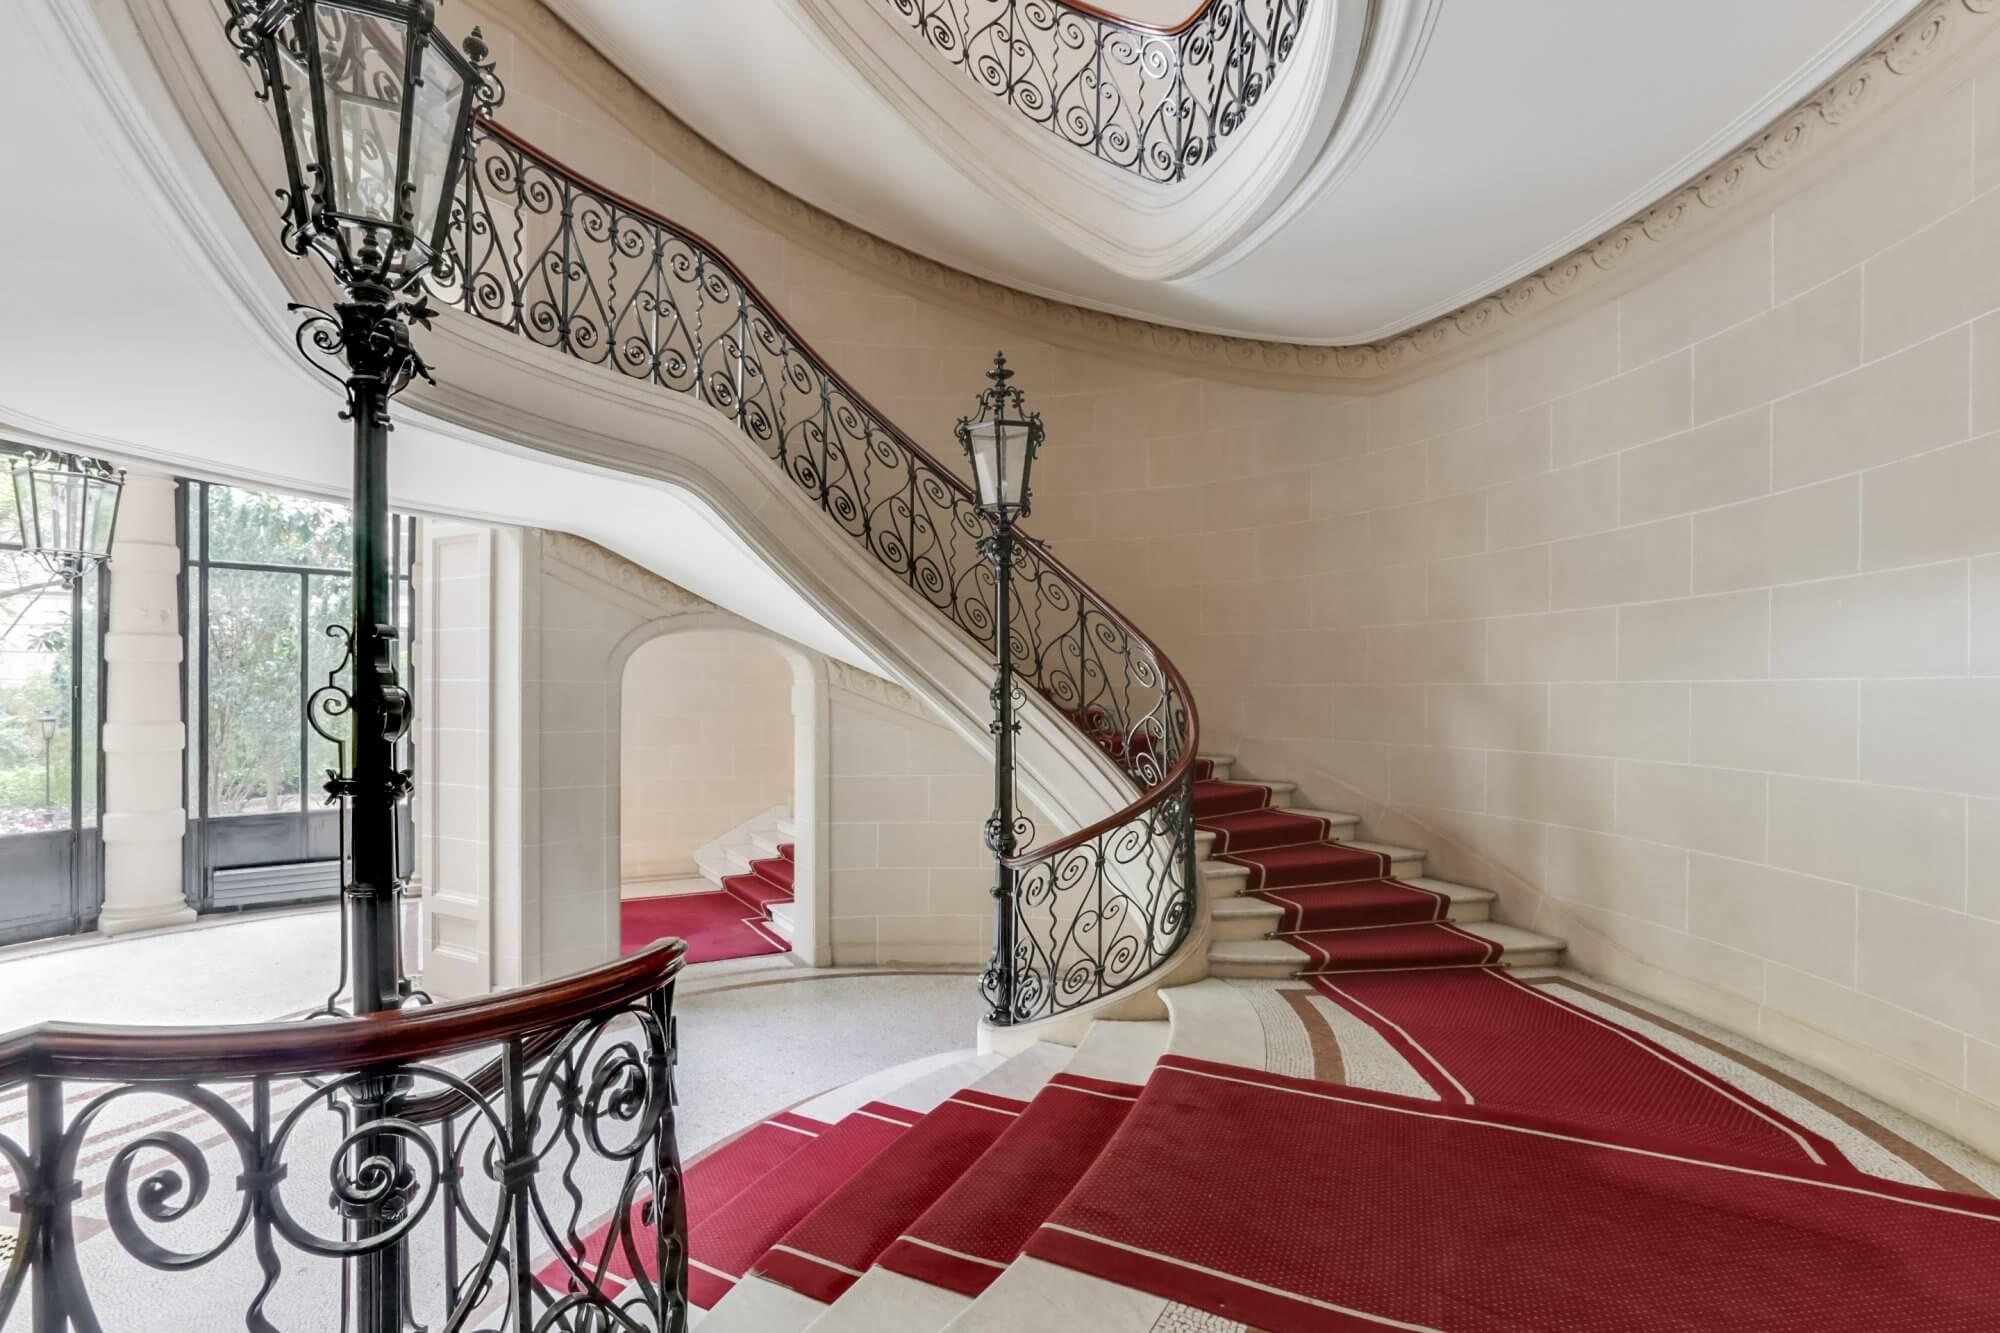 Etoile Hoche - Staircase